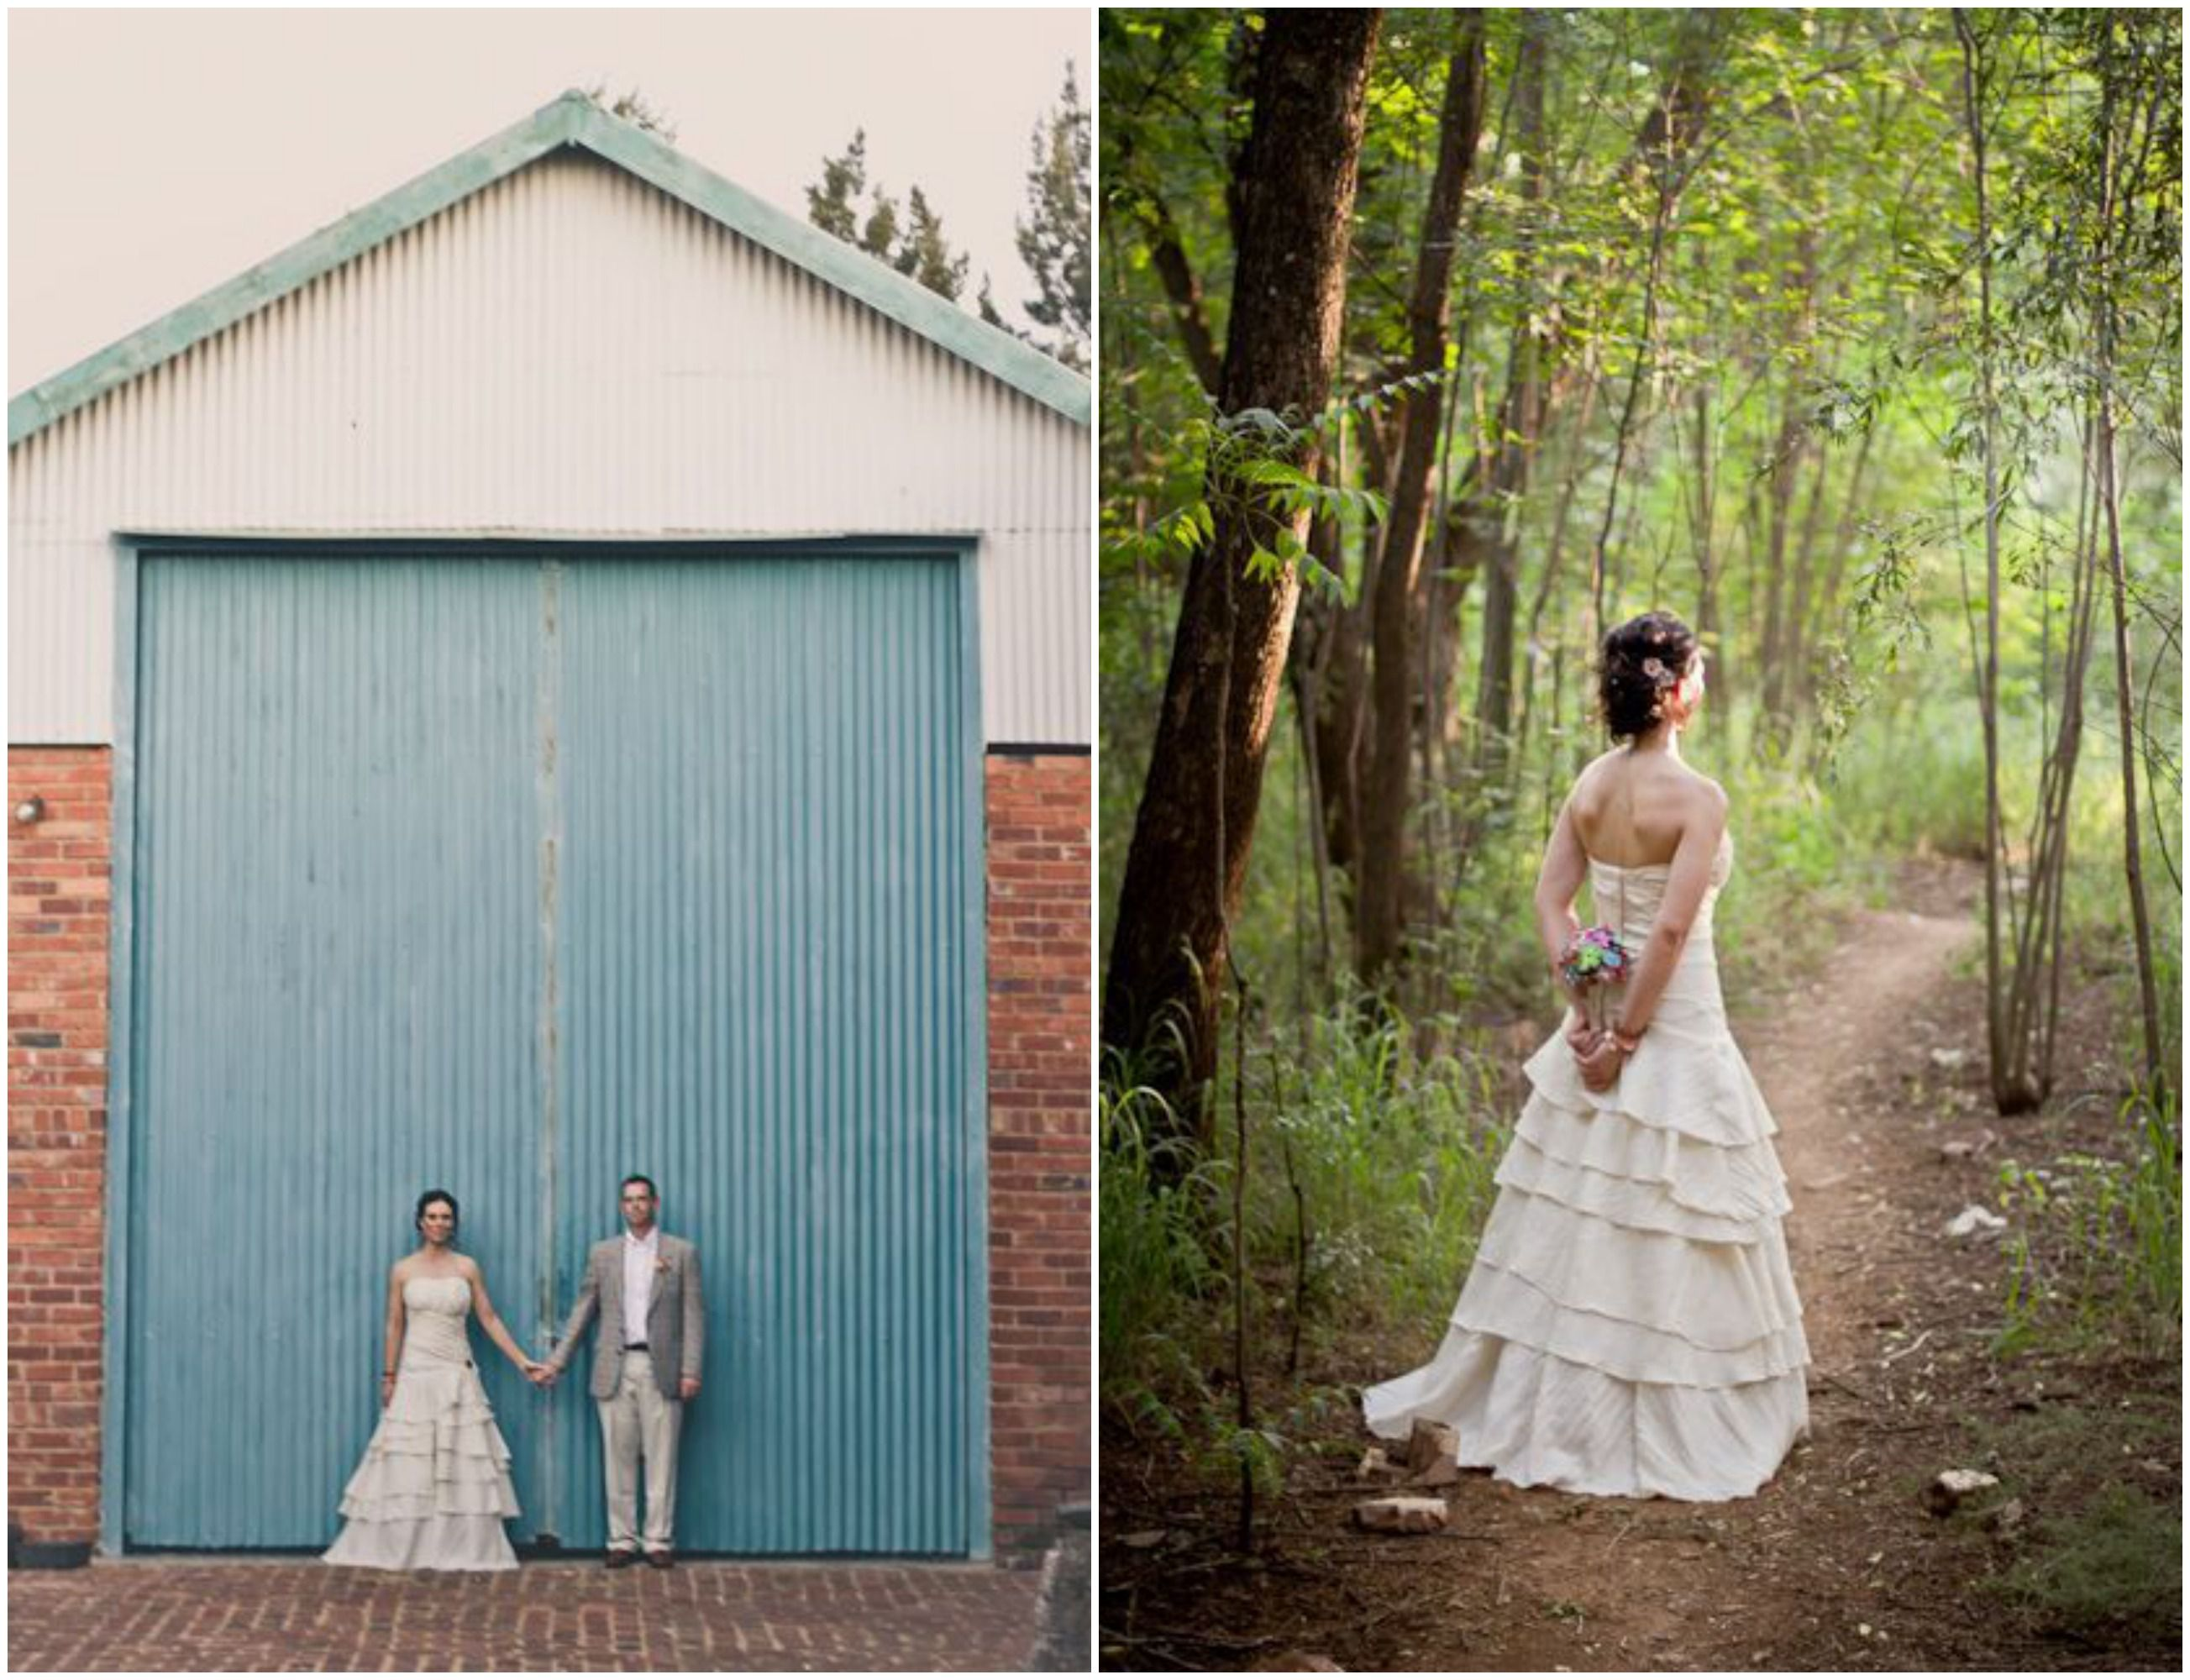 South African Rustic Wedding Rustic Wedding Chic